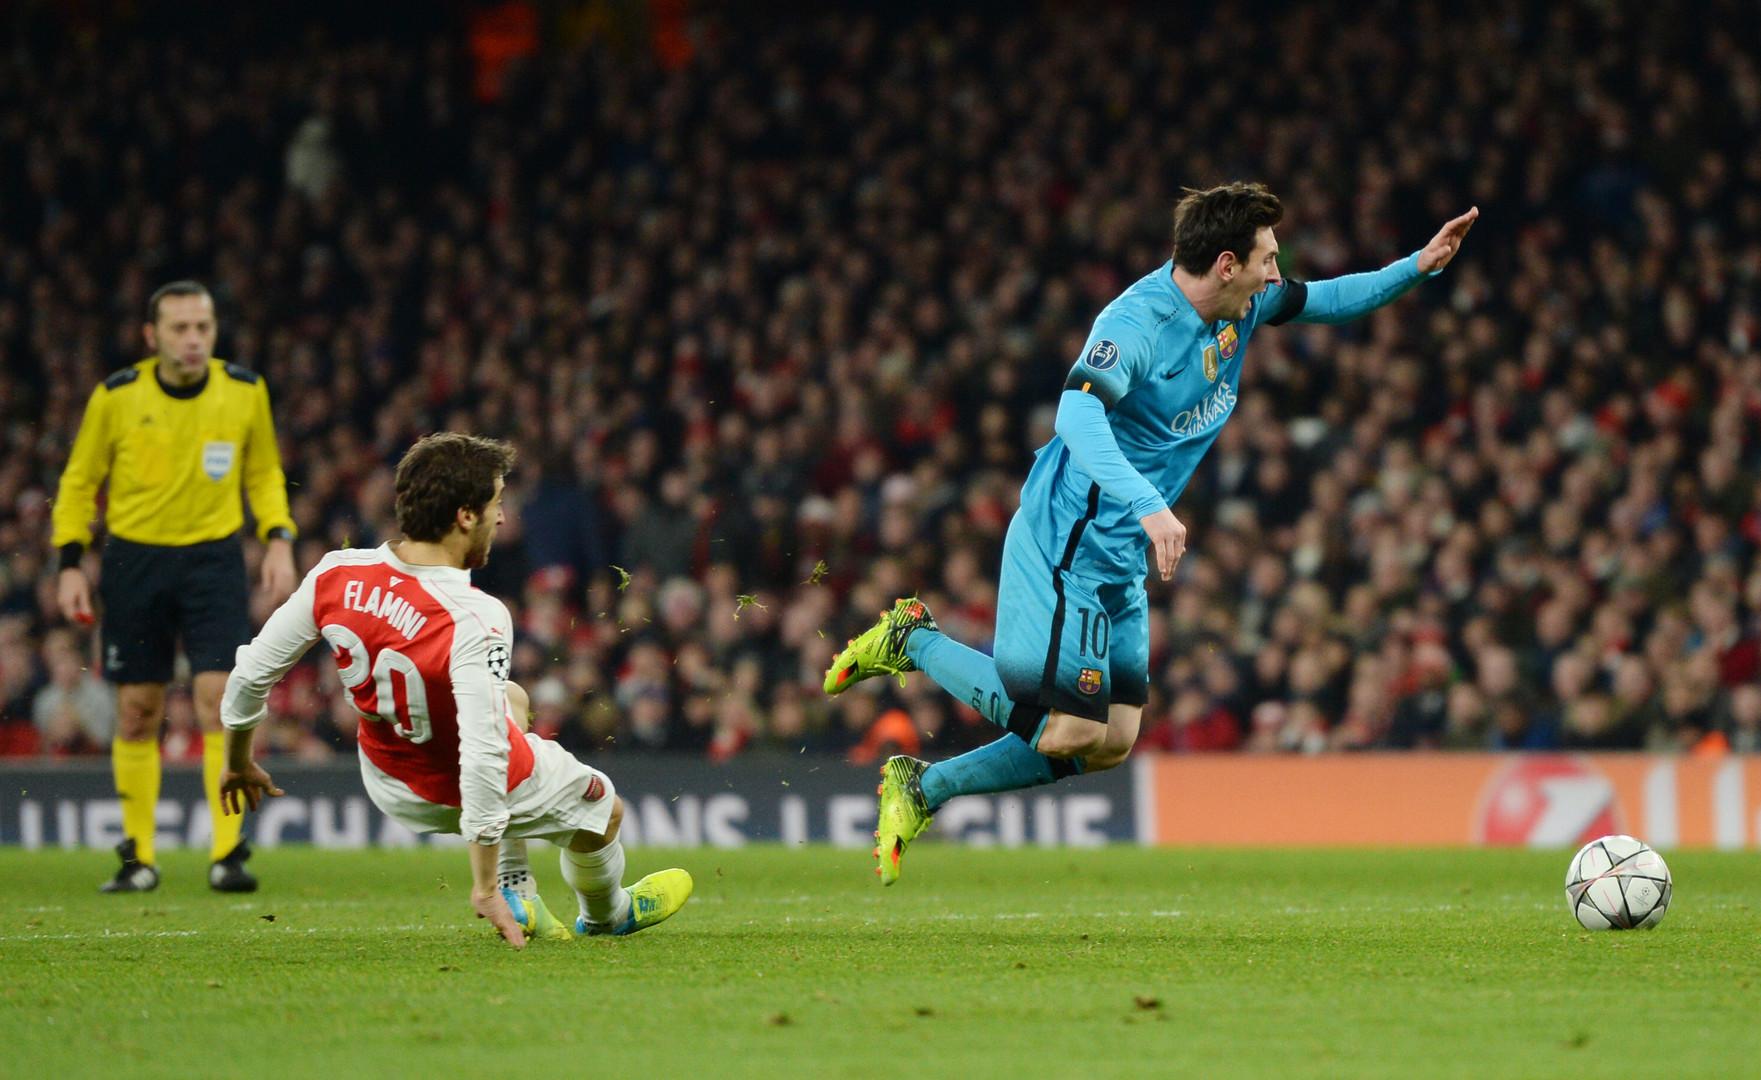 Mathieu Falmini legt Lionel Messi im Strafraum.